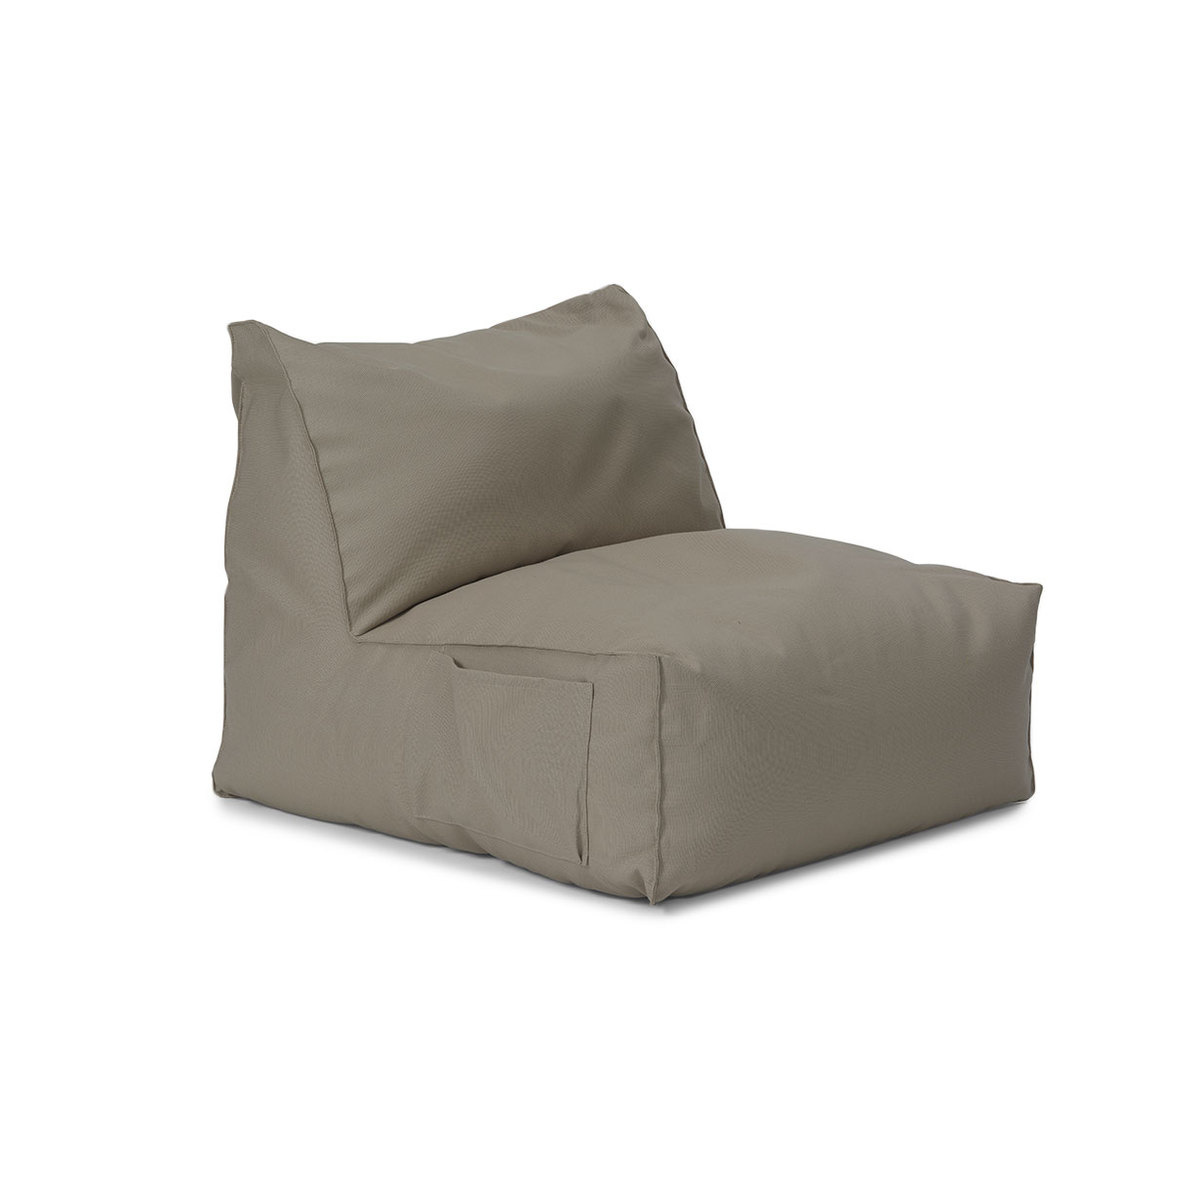 Super Easy Chair Dove Grey Machost Co Dining Chair Design Ideas Machostcouk